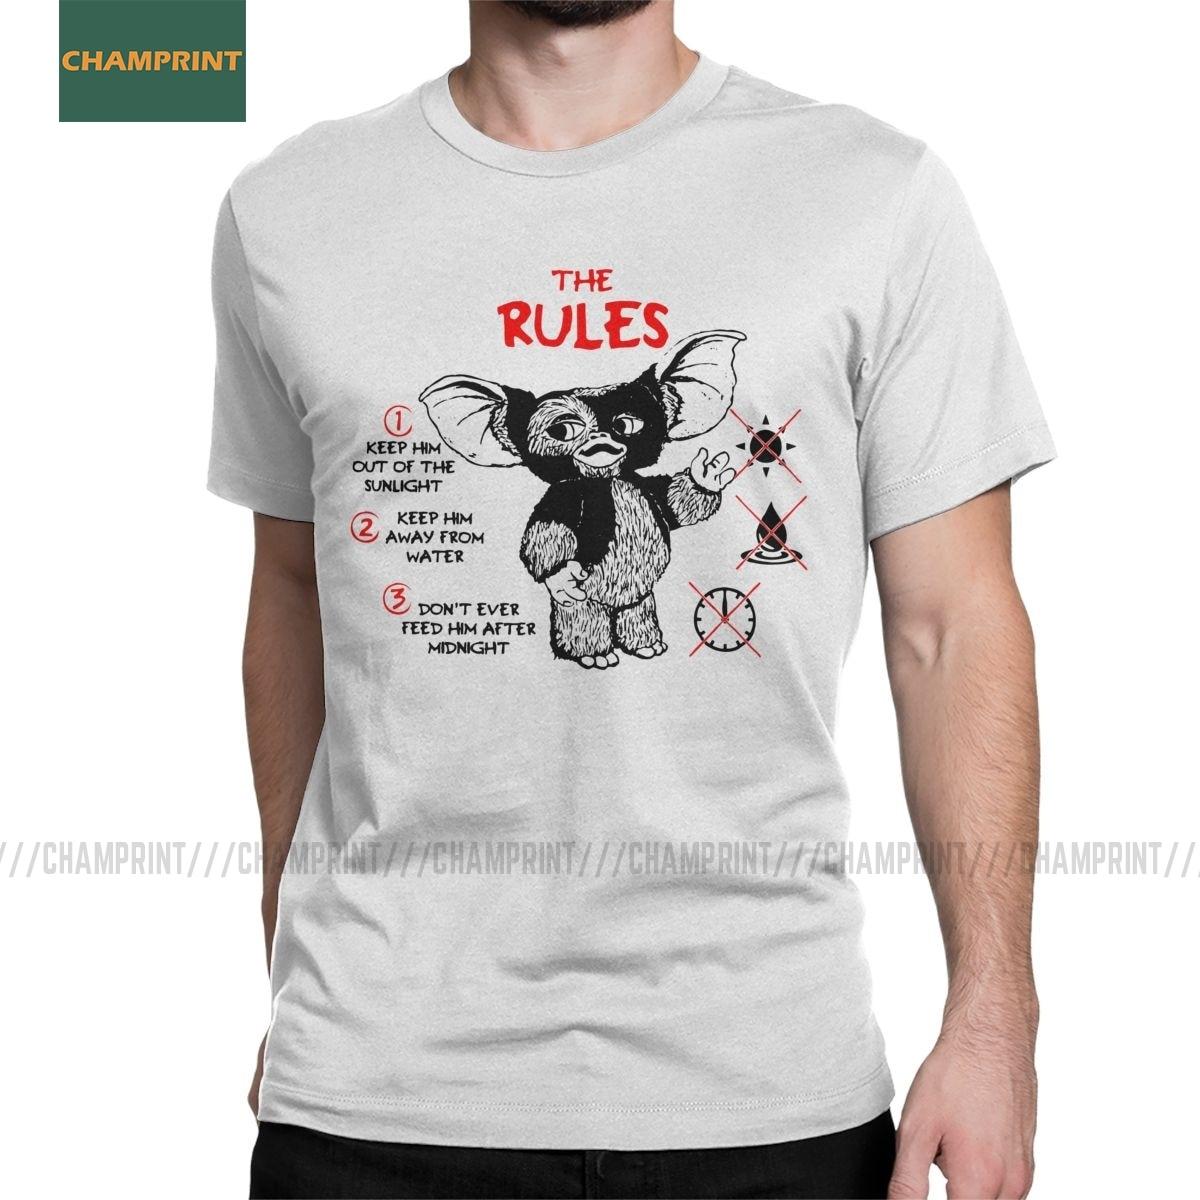 Men's Gremlins T Shirt Gizmo 80s Movie Mogwai Monster Retro Sci Fi Cotton Clothes Short Sleeve Tee Shirt Big Size T-Shirts